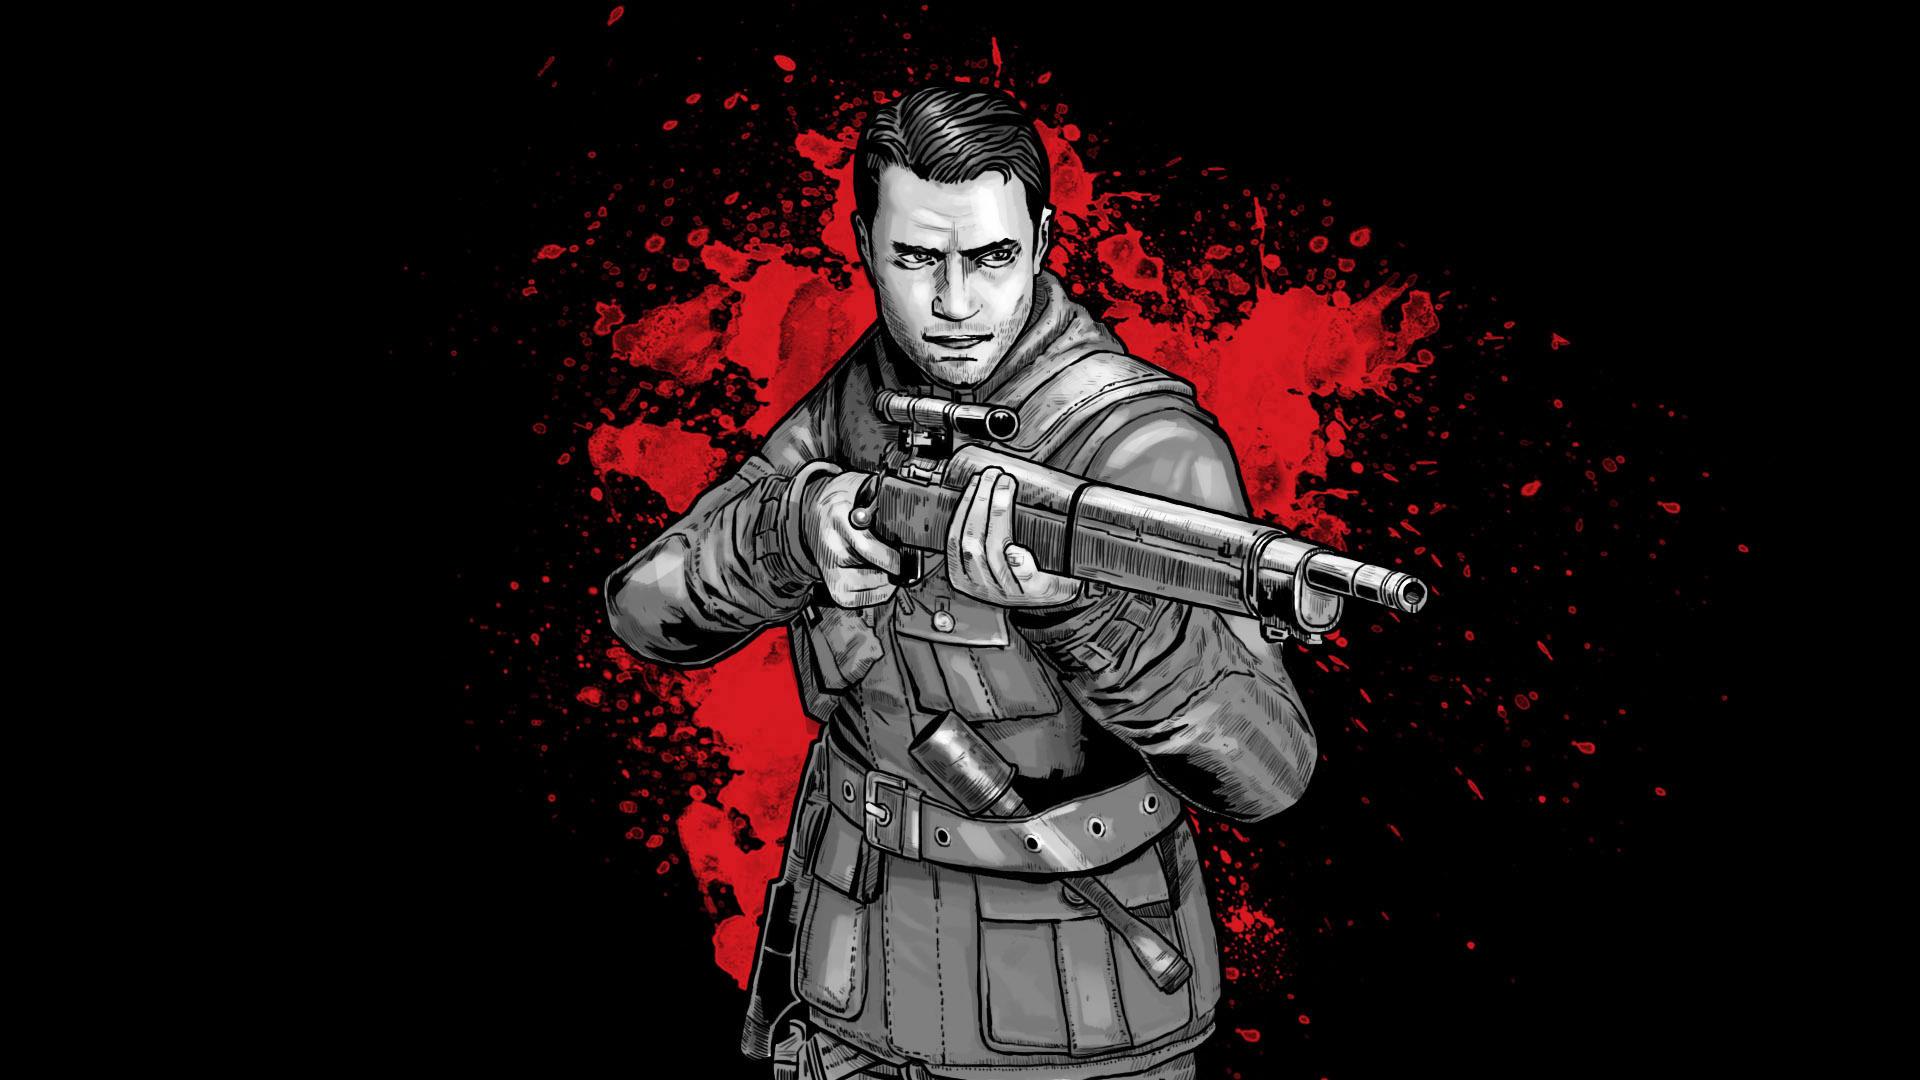 Sniper Elite Nazi Zombie Army Artwork 1.jpg